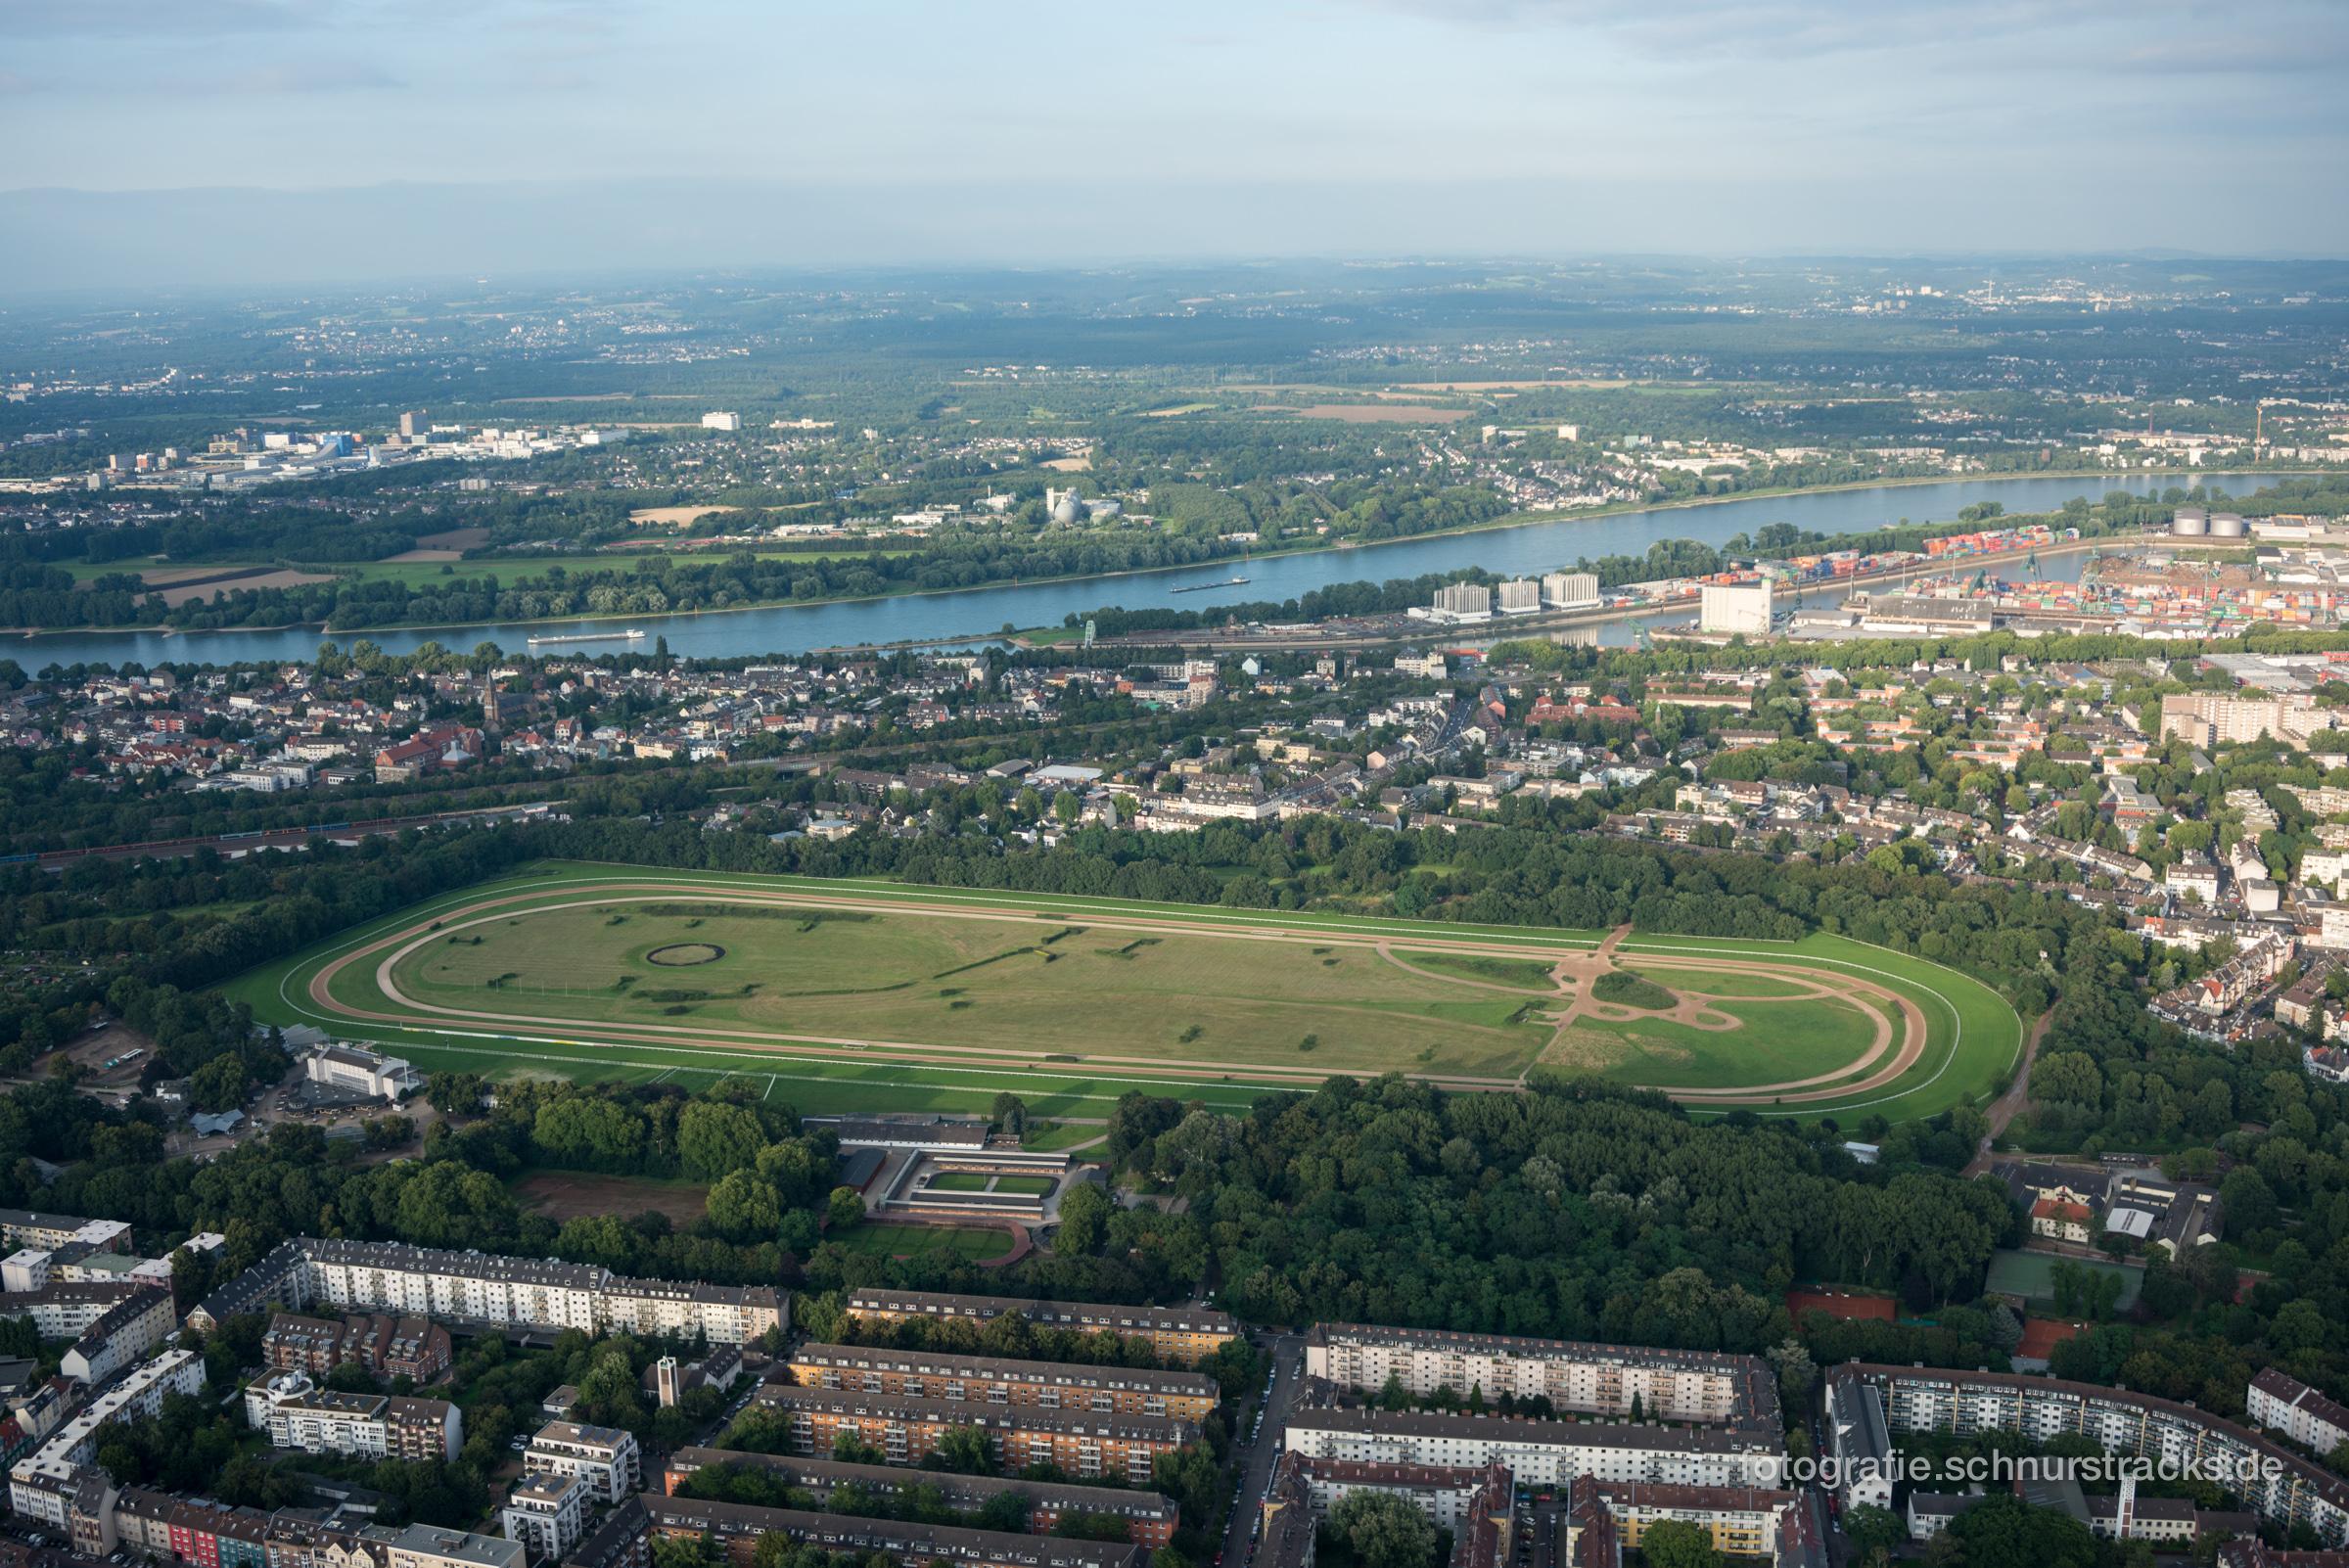 Pferderennbahn Köln Weidenpesch